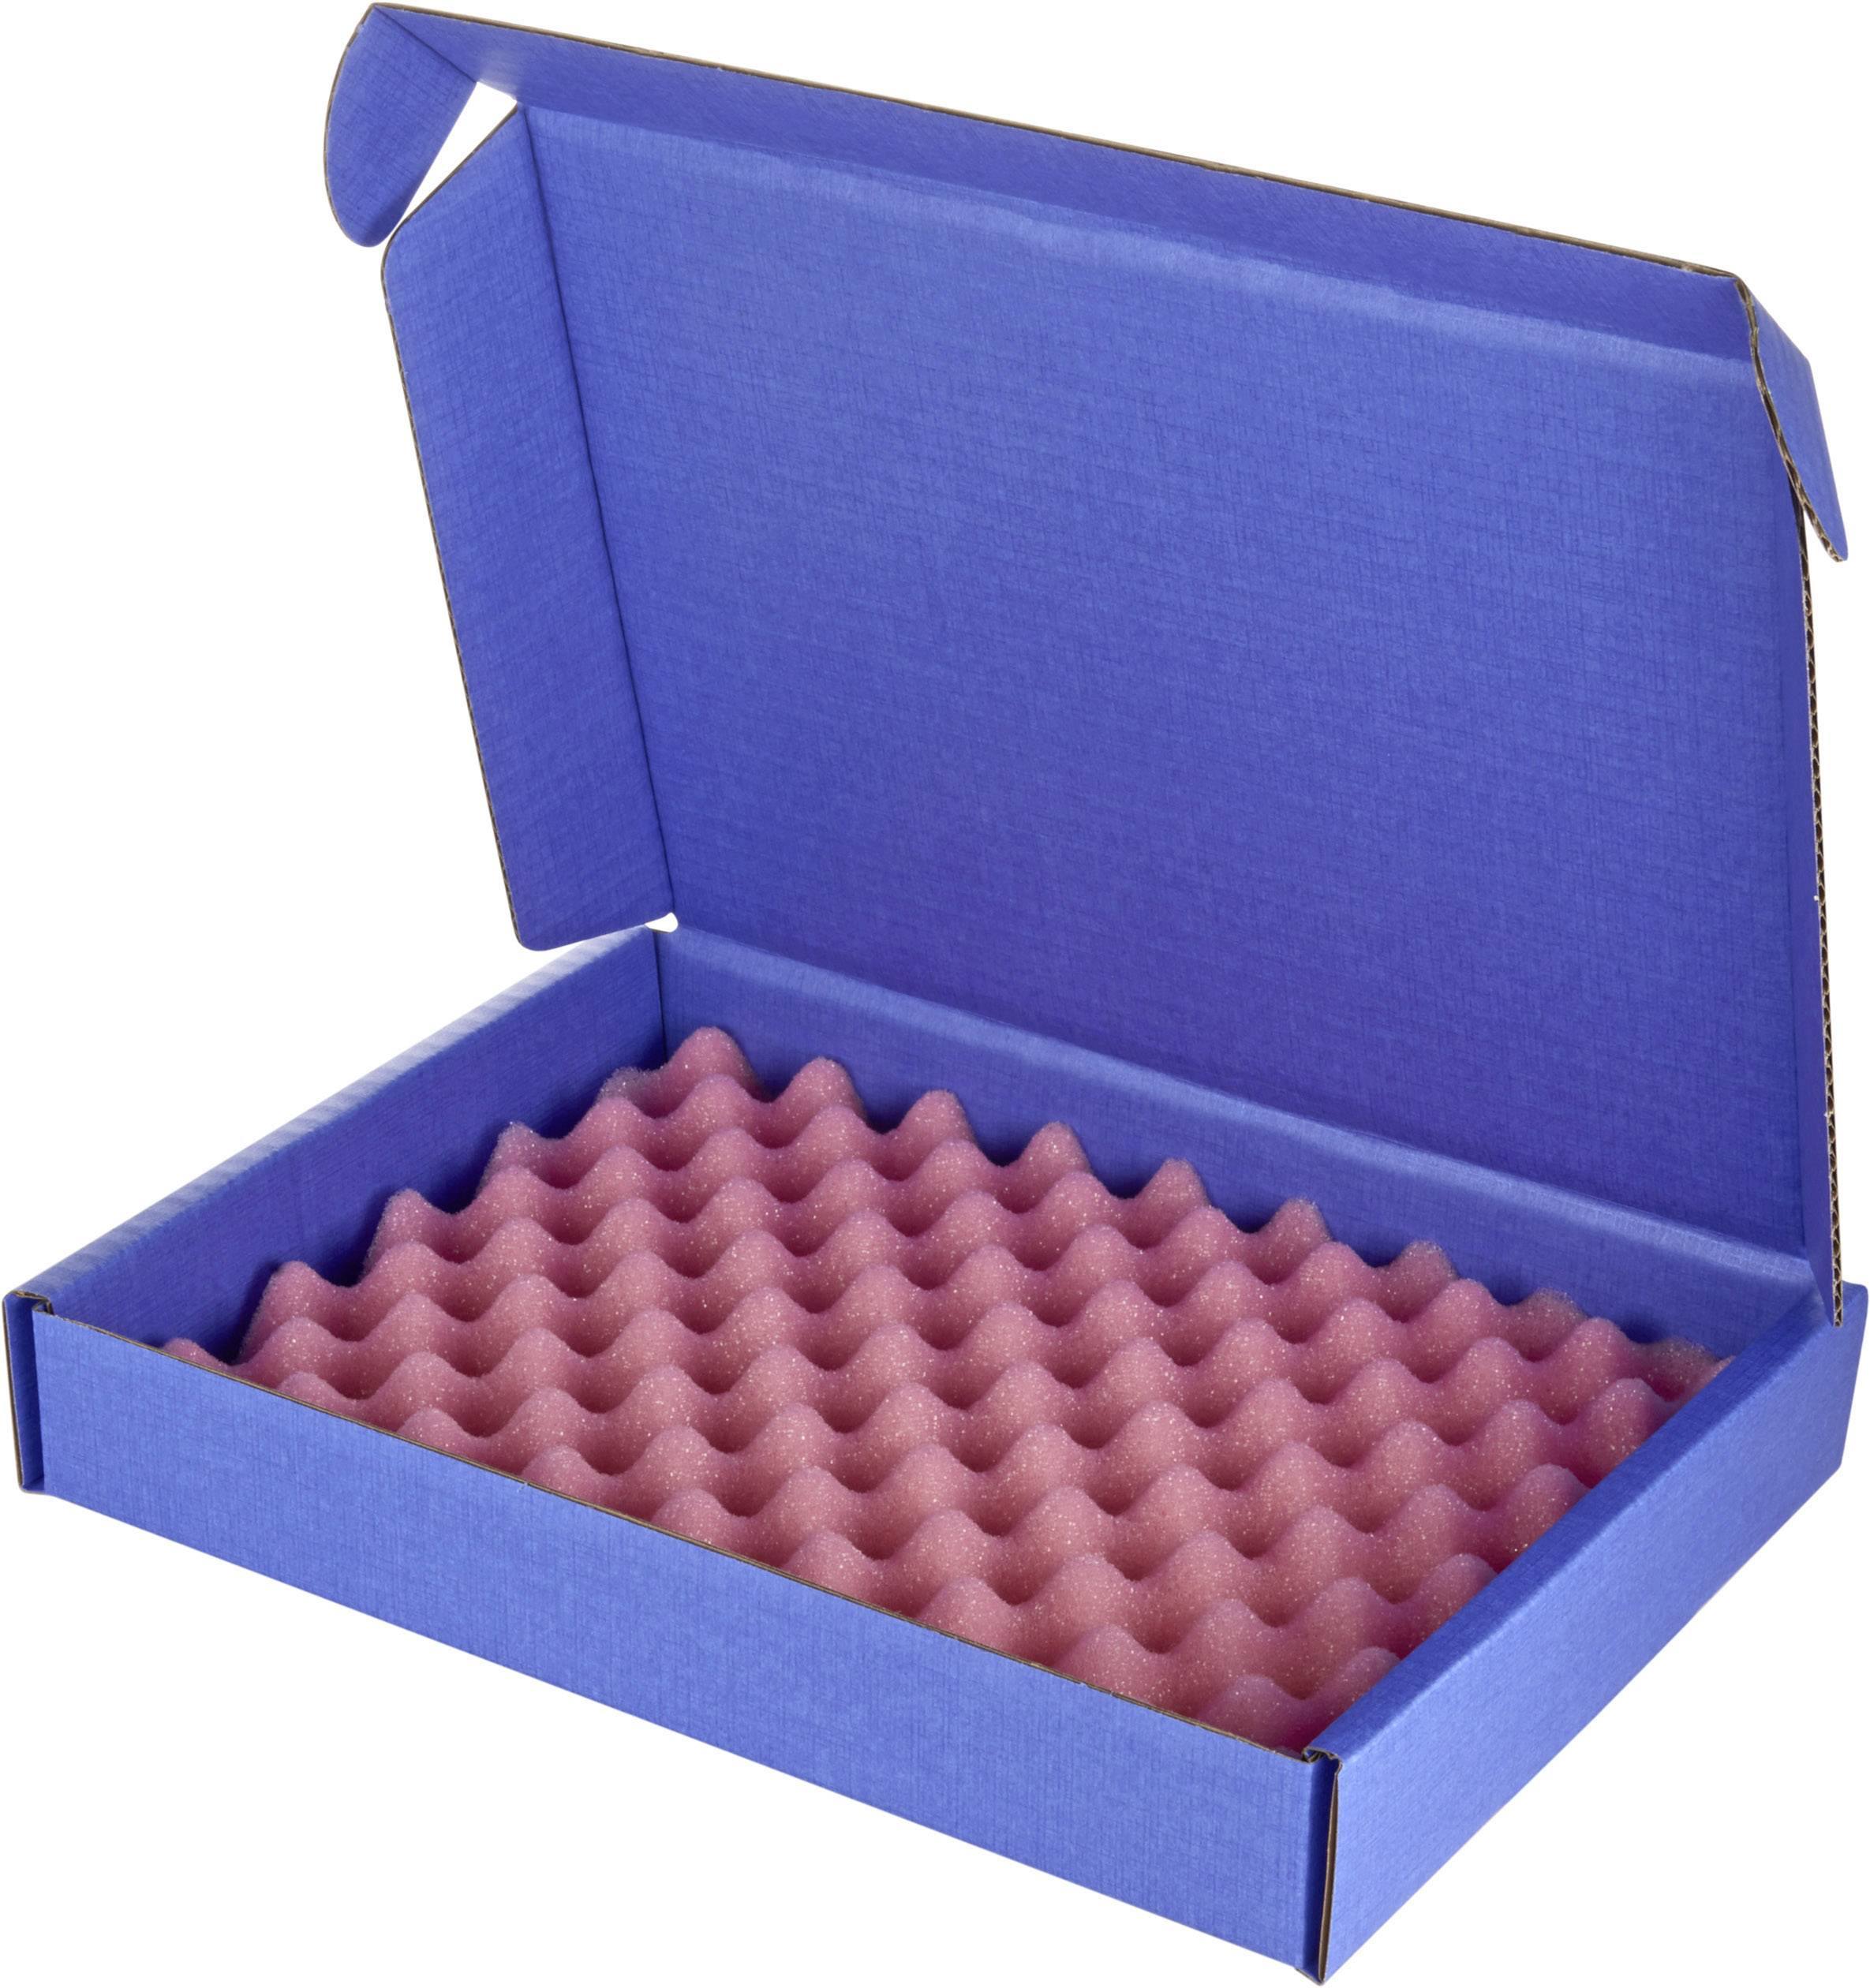 ESD krabica Wolfgang Warmbier 5510.904.A20, (d x š x v) 250 x 191 x 38 mm, modrá